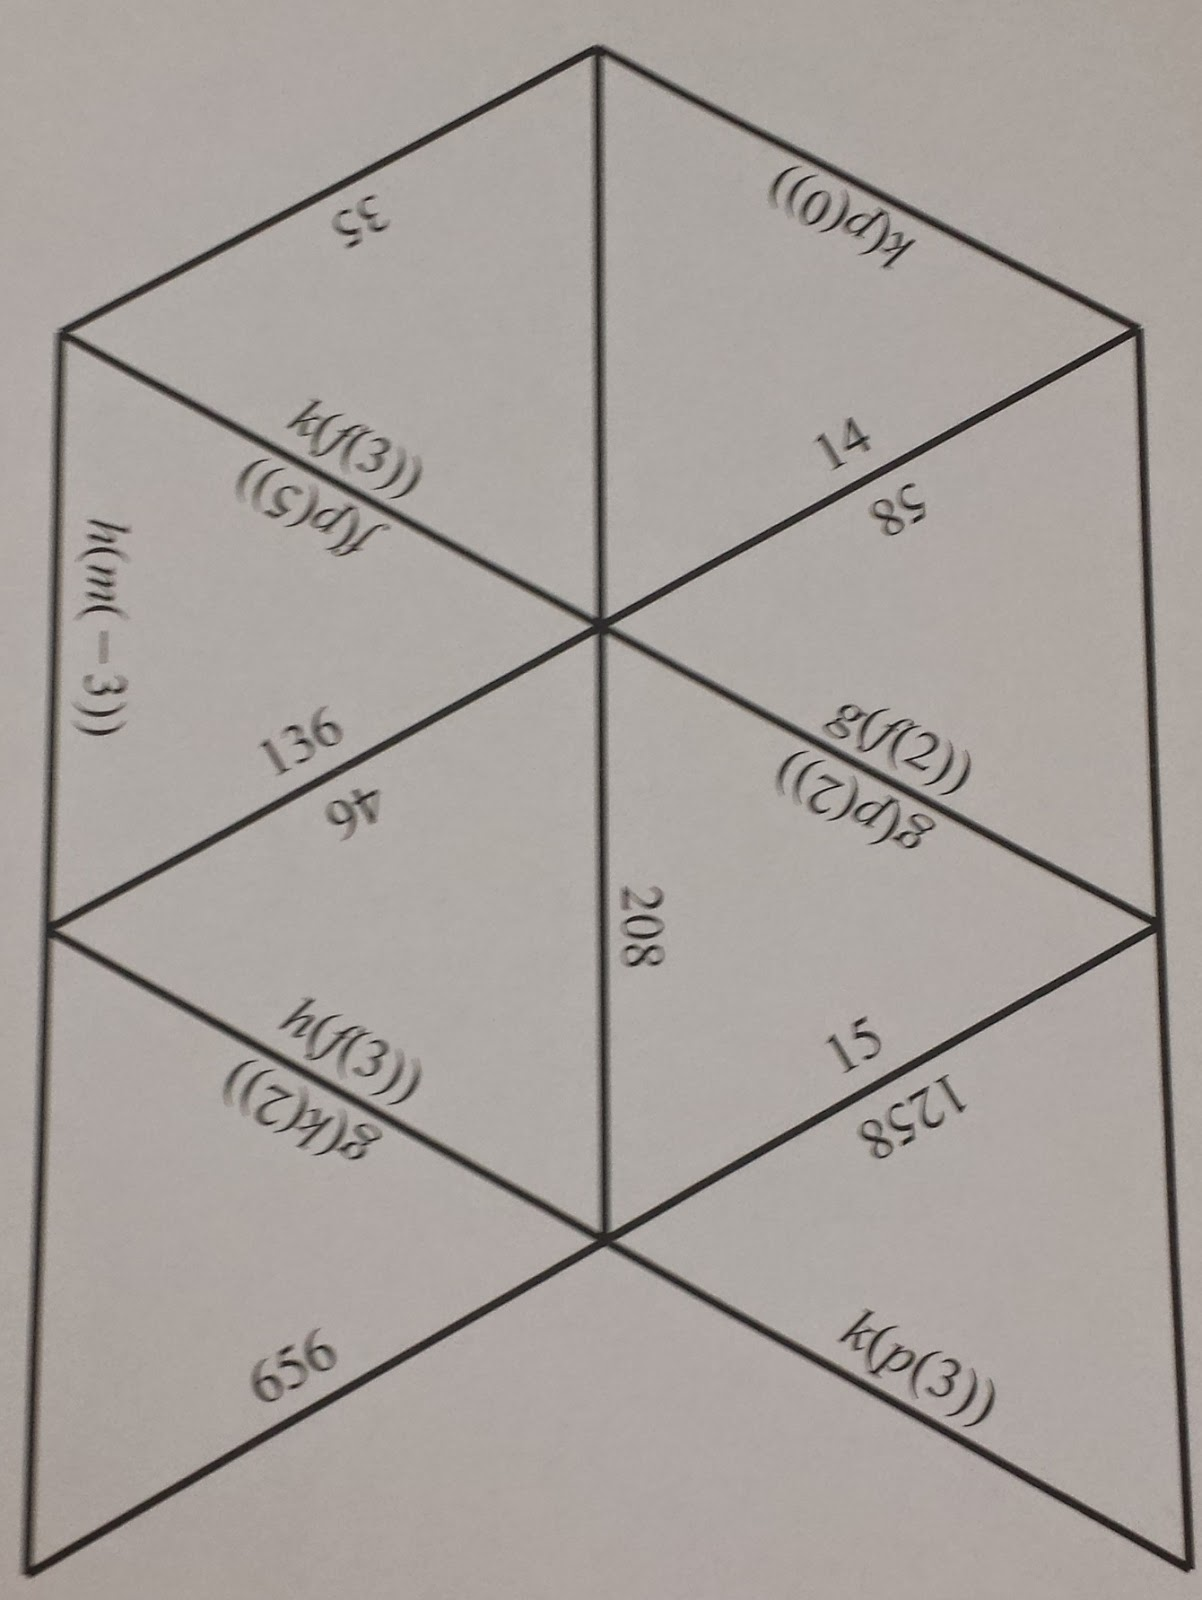 Worksheets Composition Of Functions Worksheet